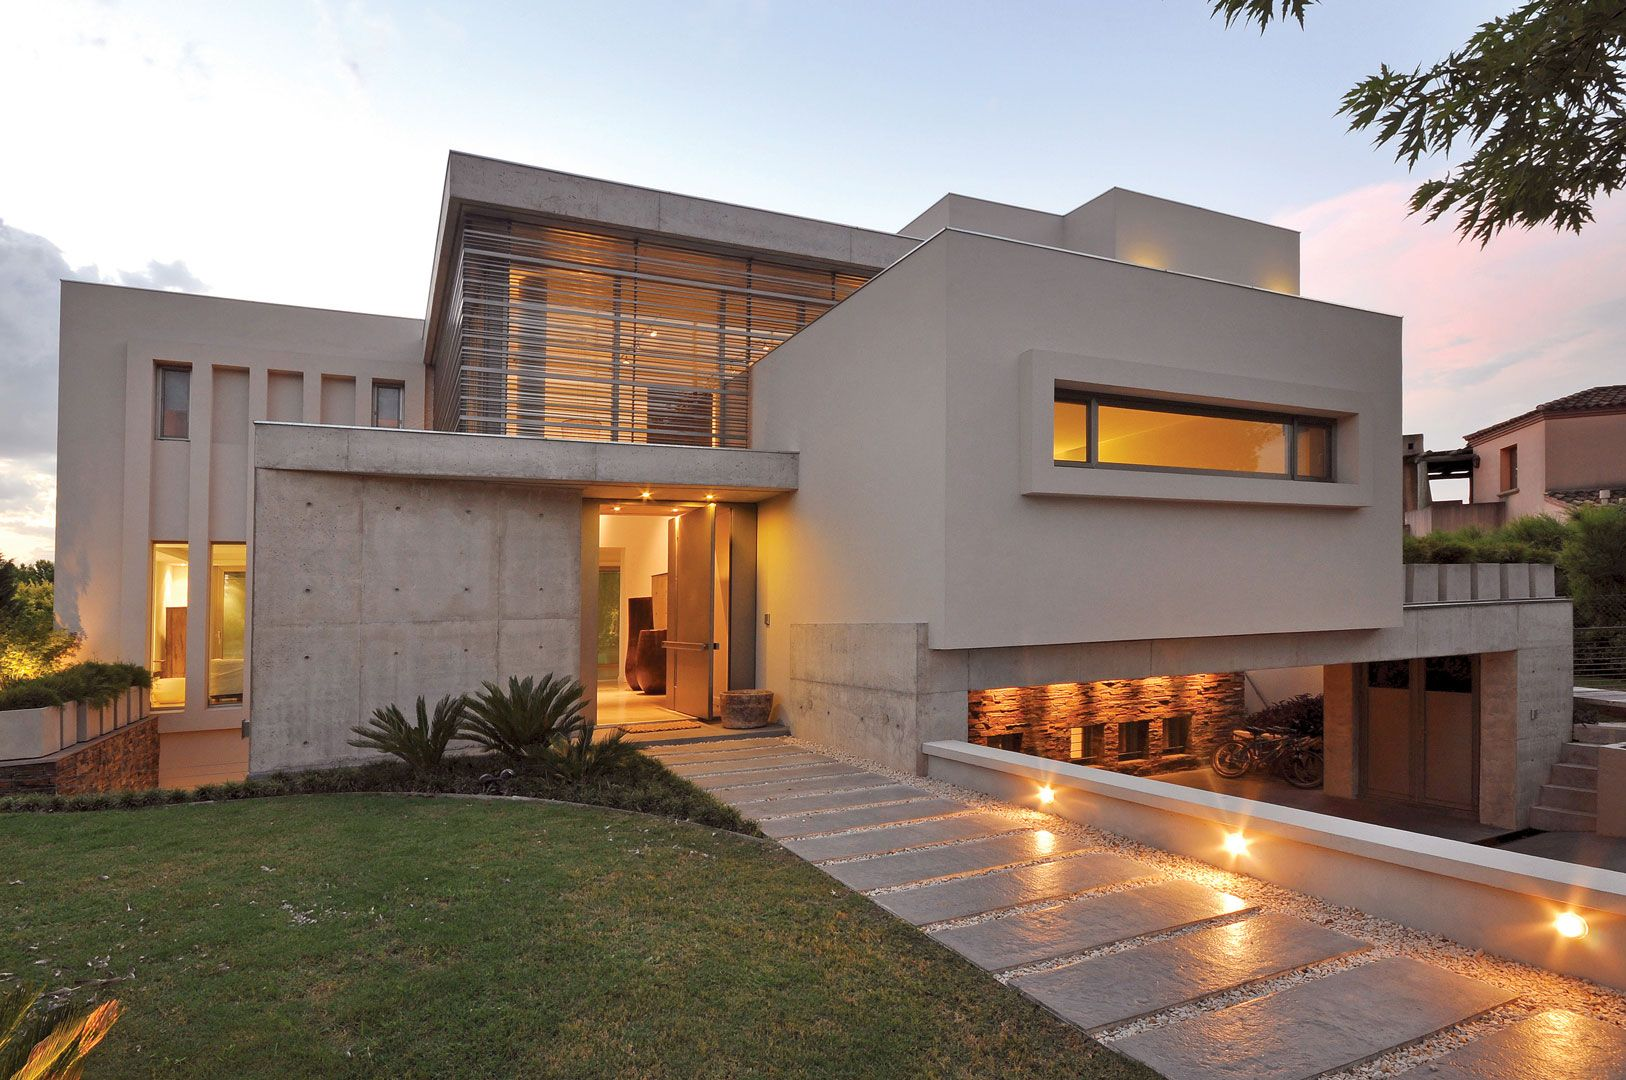 Estudio gamboa casa mmp en 2018 arq pinterest for Portal de arquitectos casa de campo